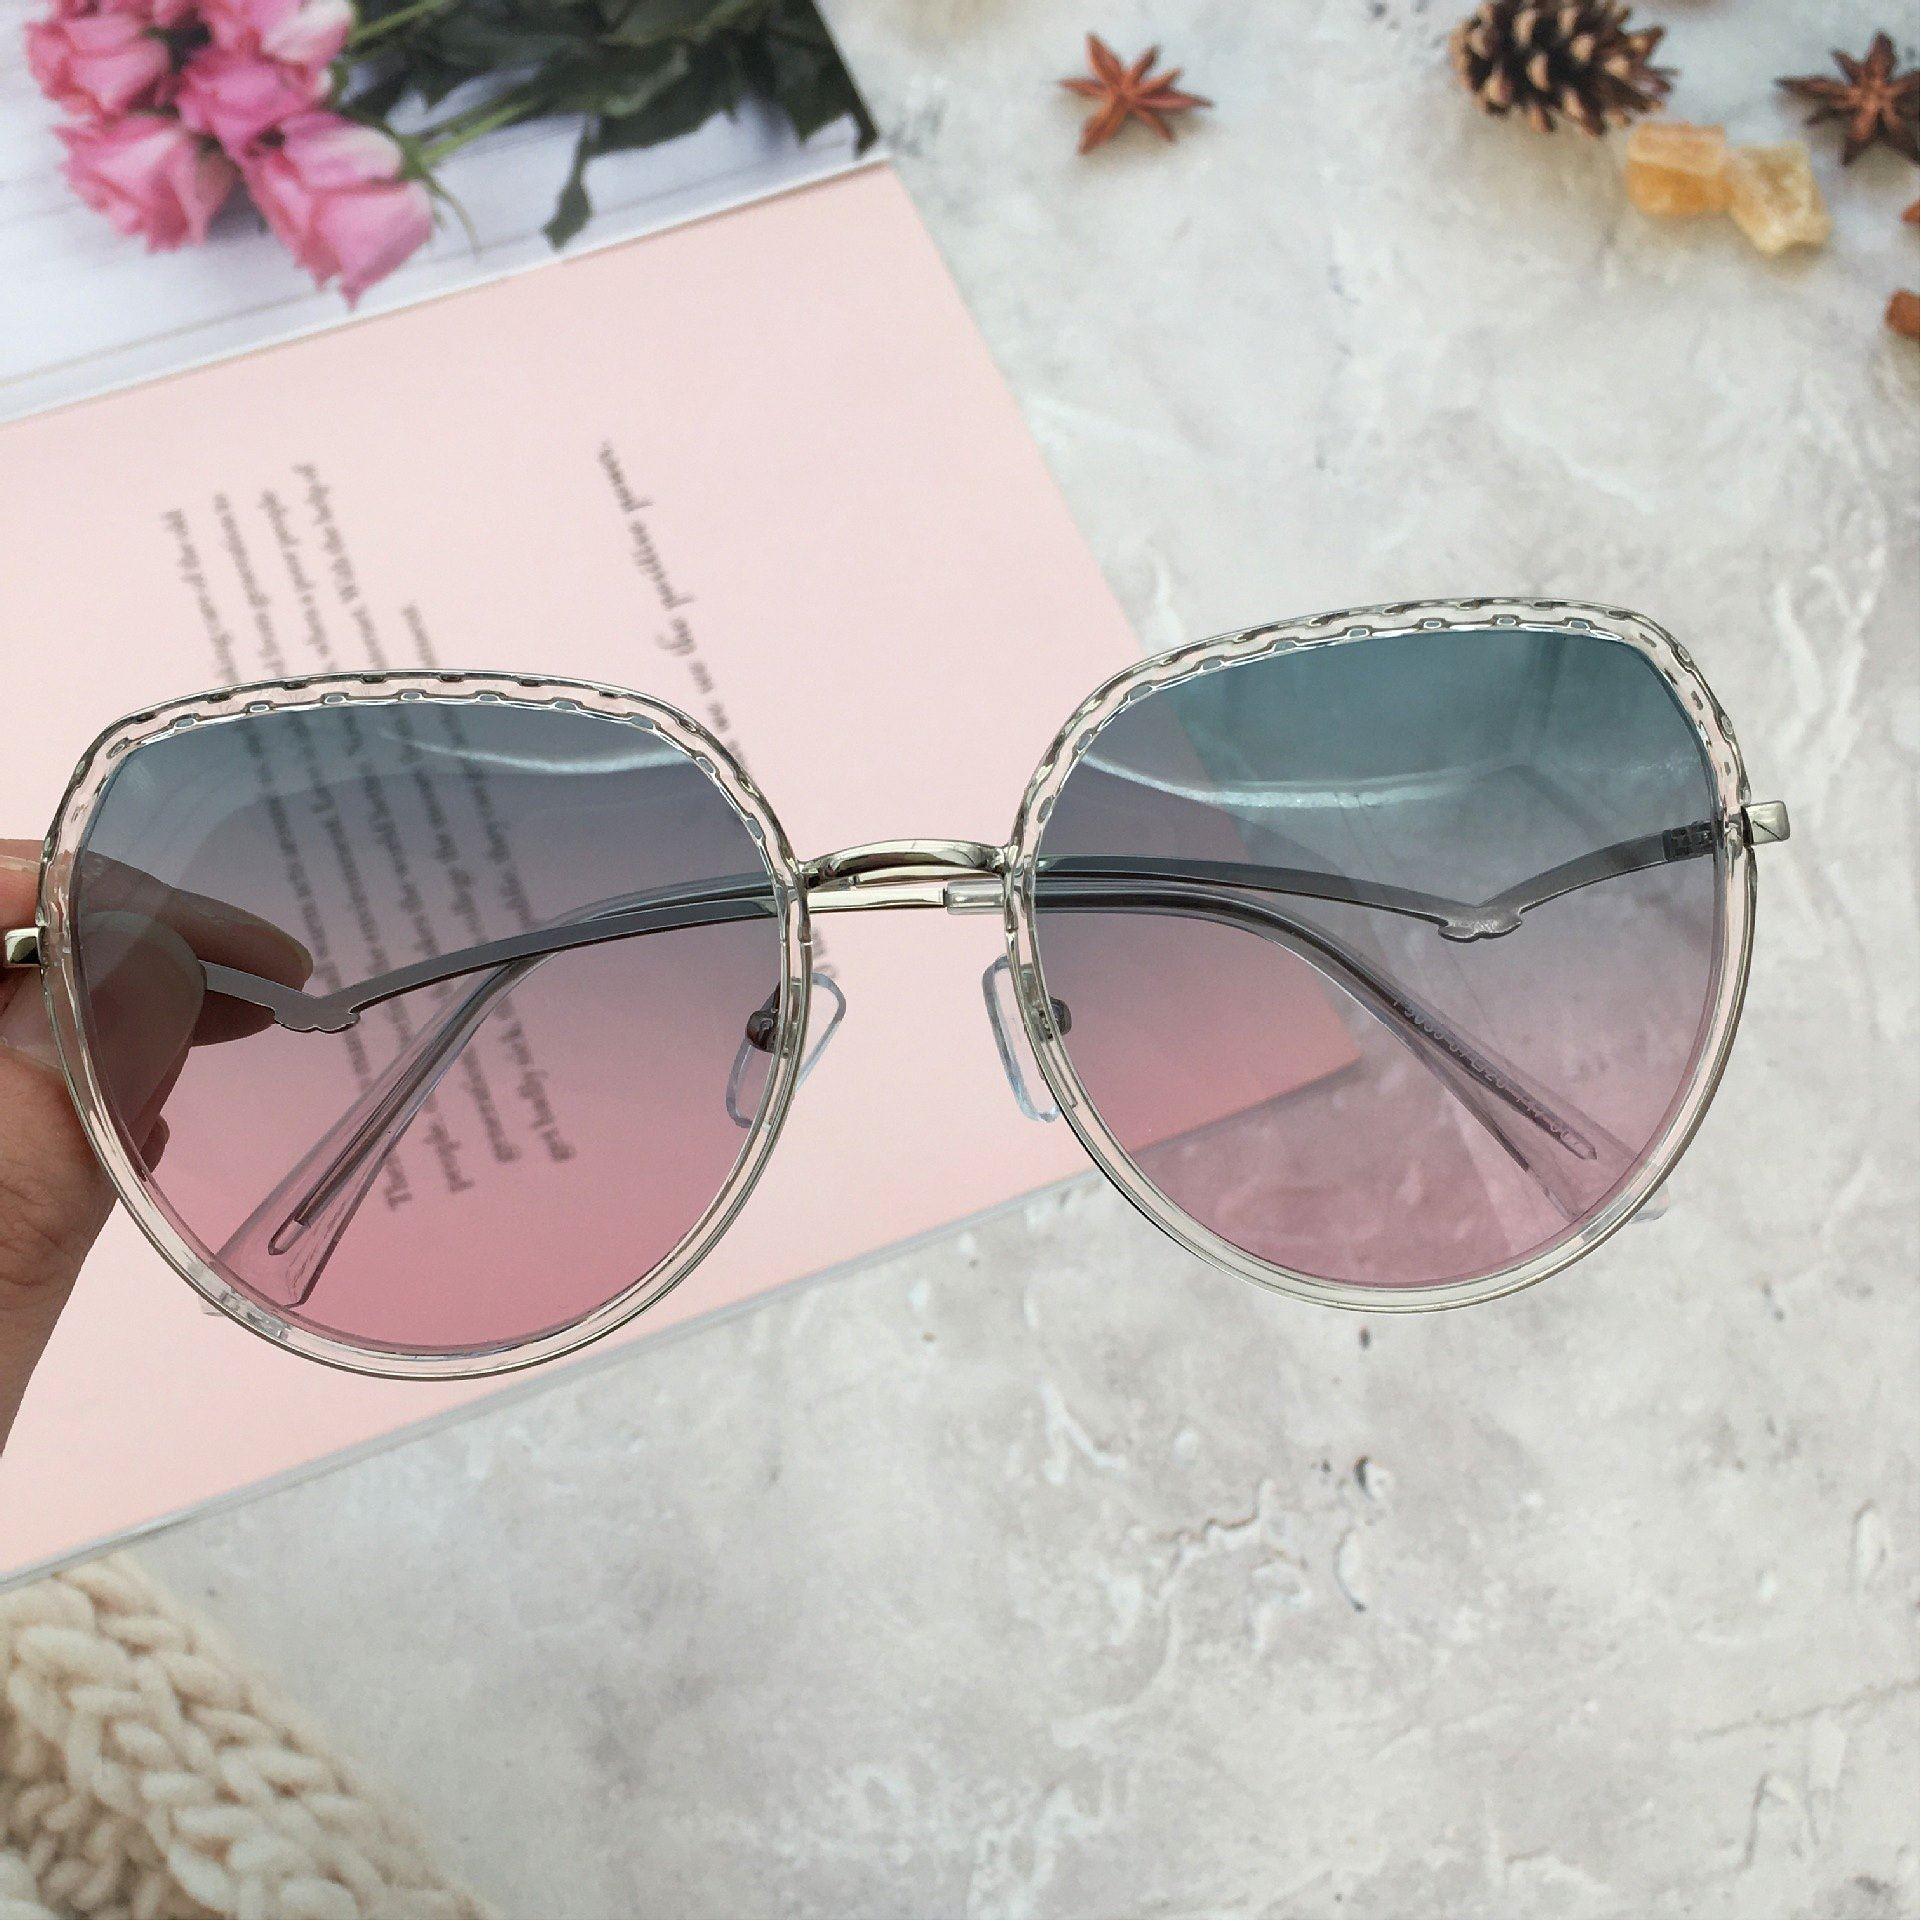 Big frame glasses elegant fashion new fashion polarizing sunglasses female gradient big face transparent Sunglasses female f5025